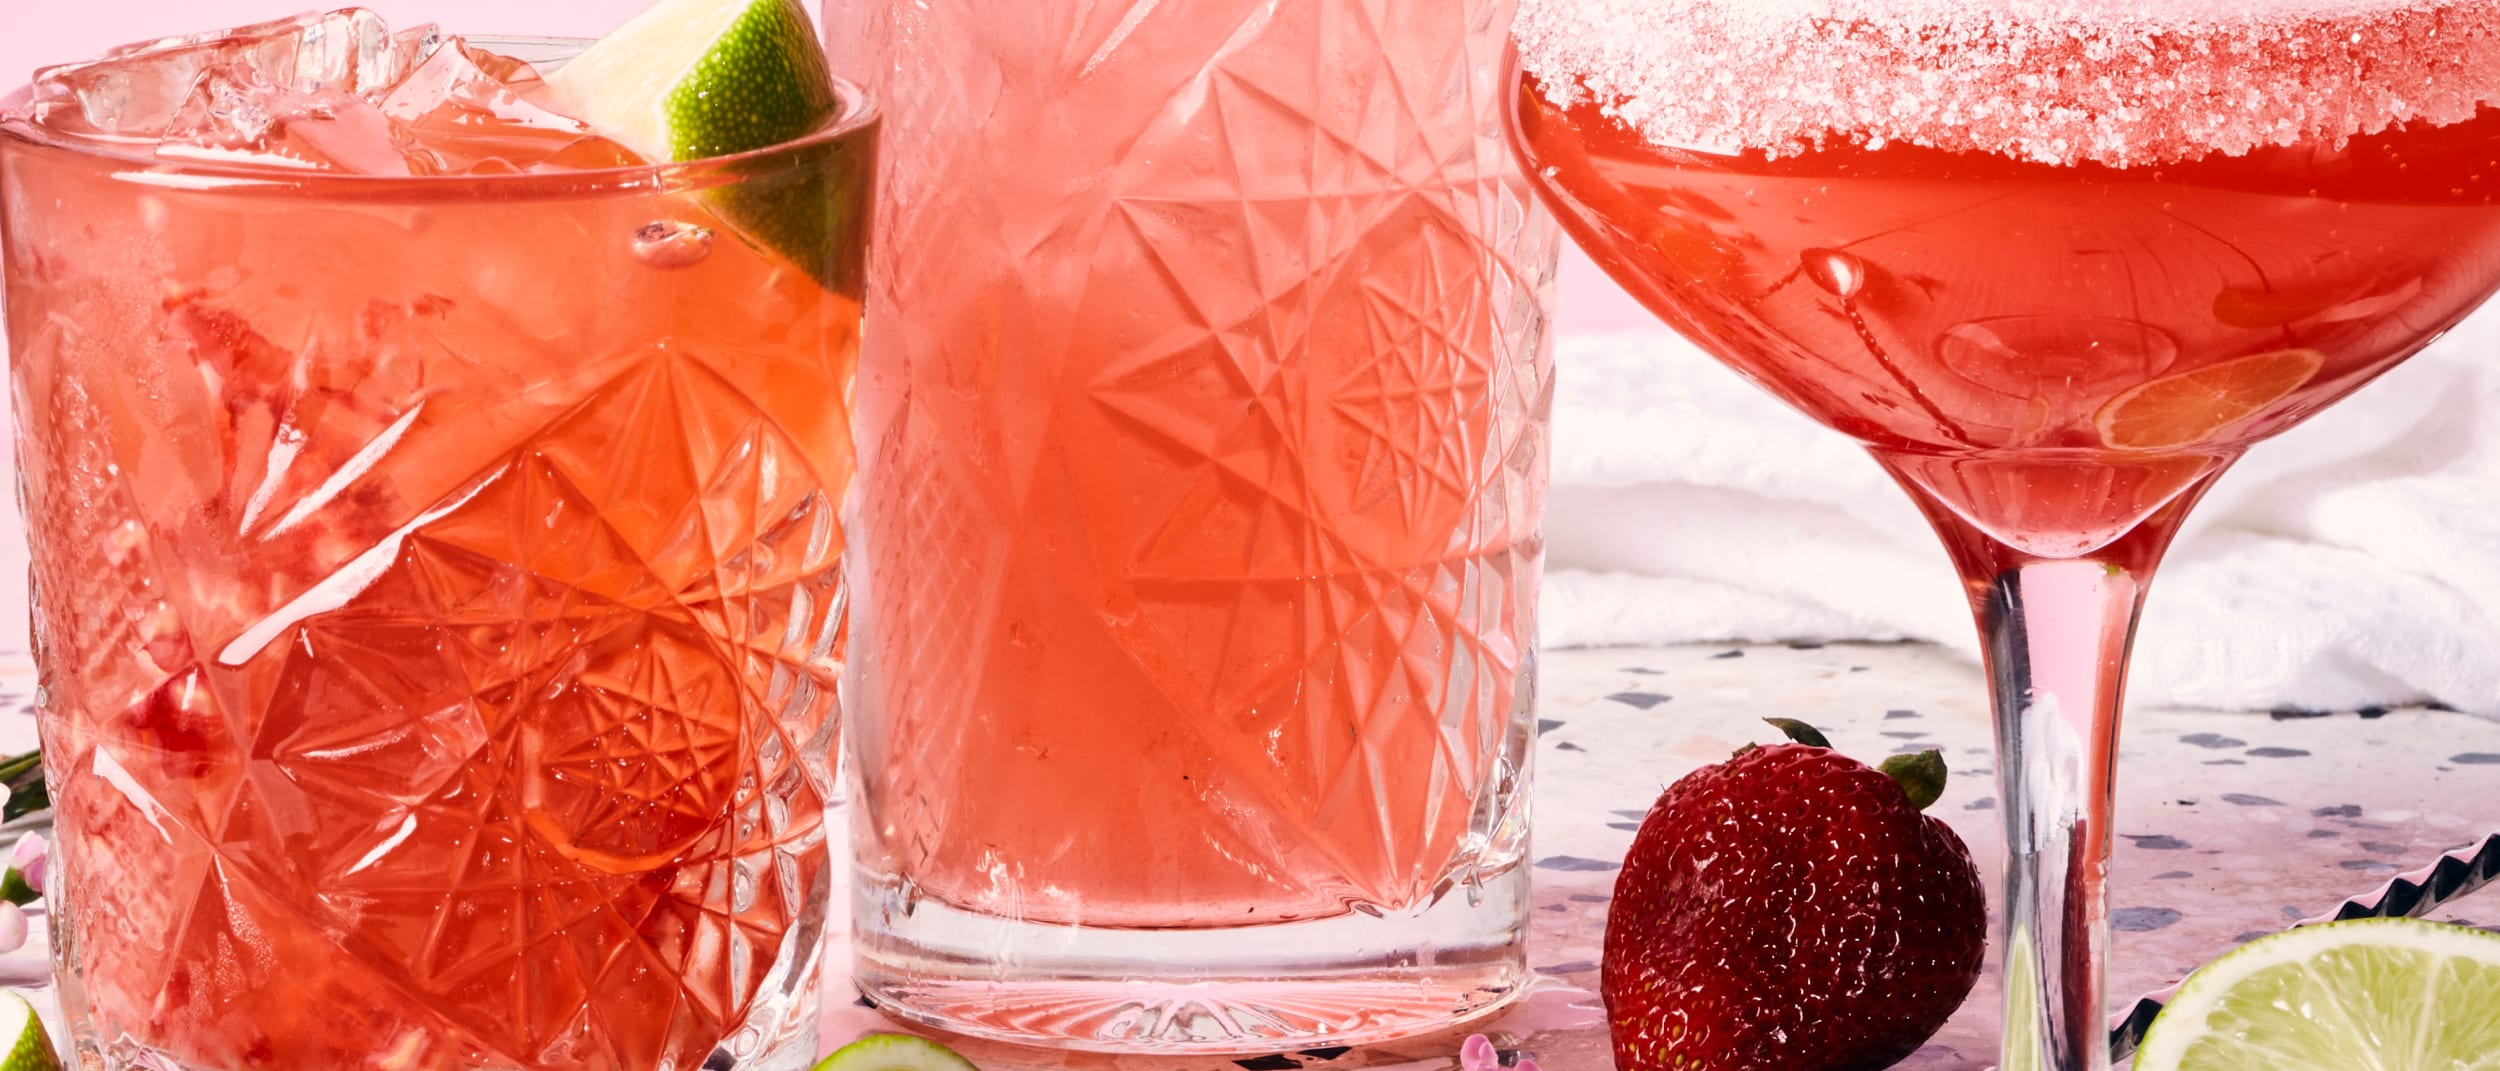 TGI FRIDAYS: Summer cocktails